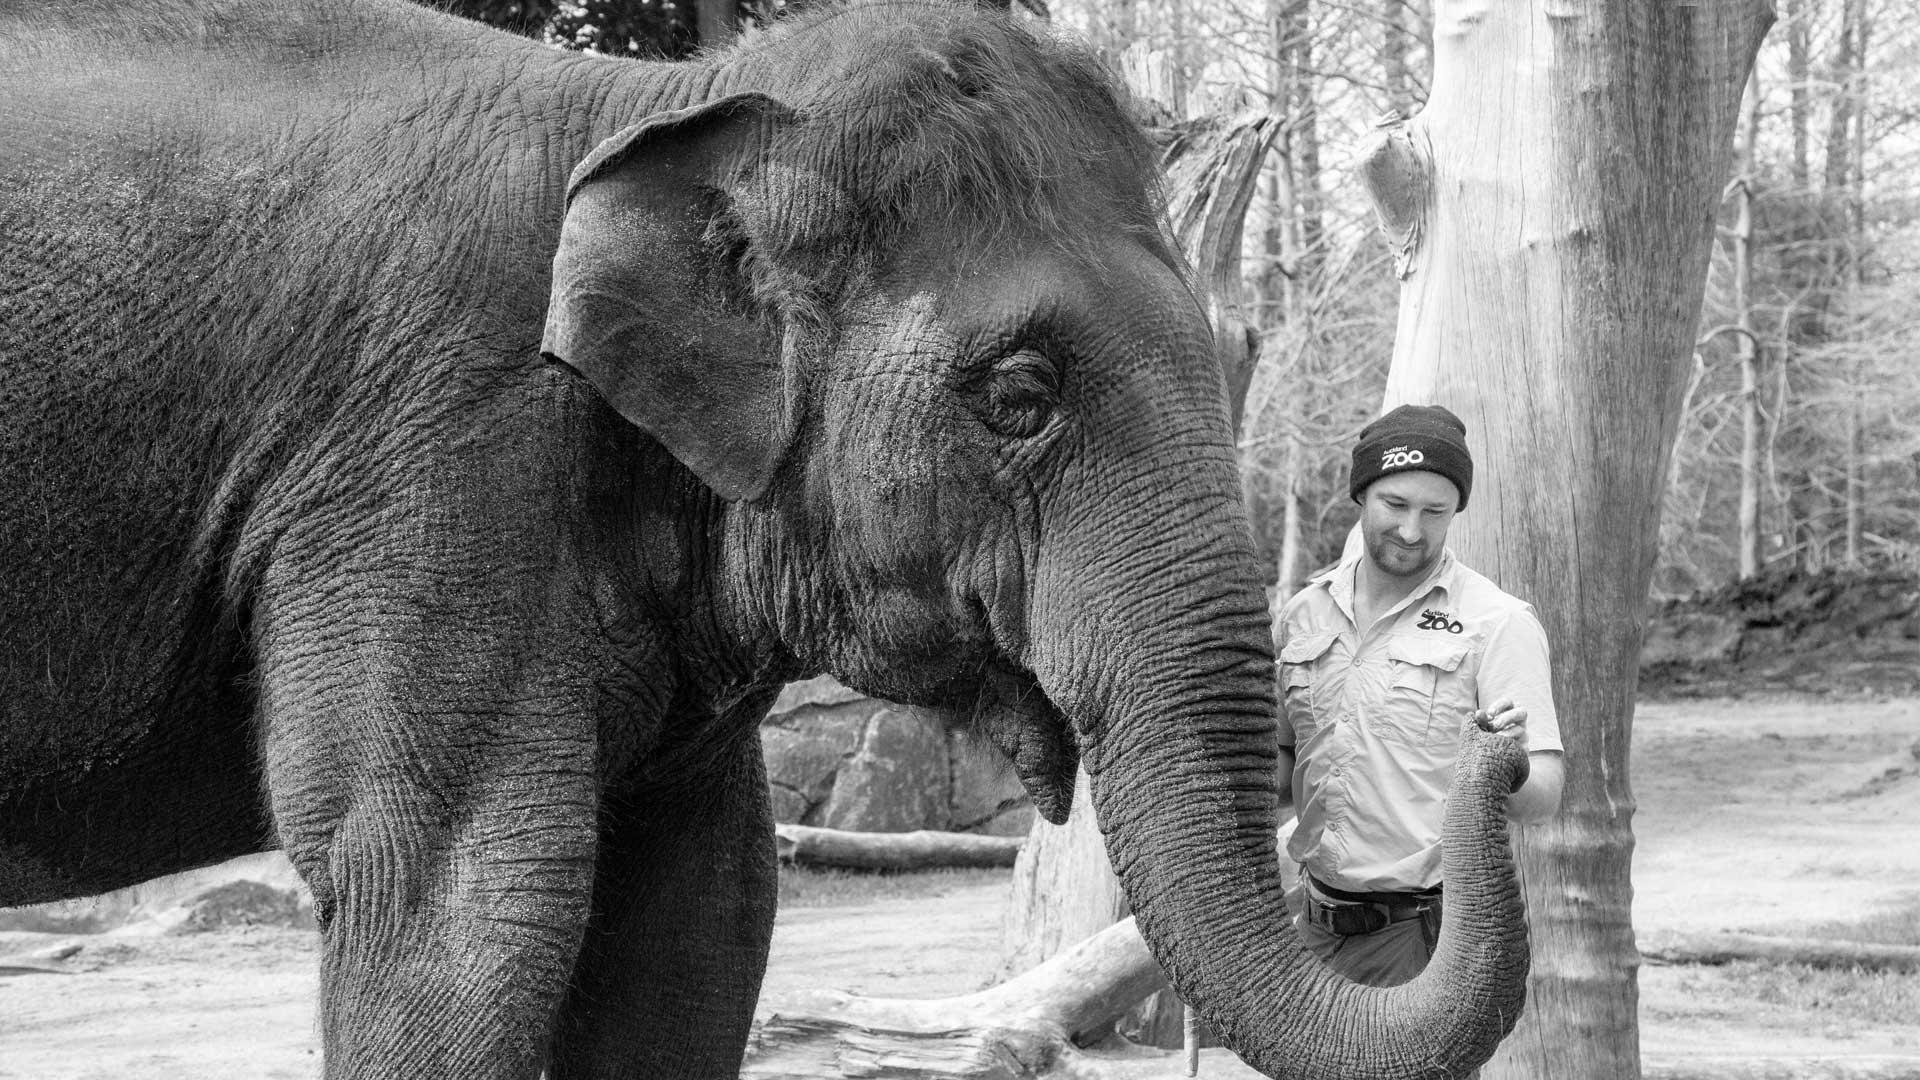 https://rfacdn.nz/zoo/assets/media/world-elephant-day-gallery-13.jpg